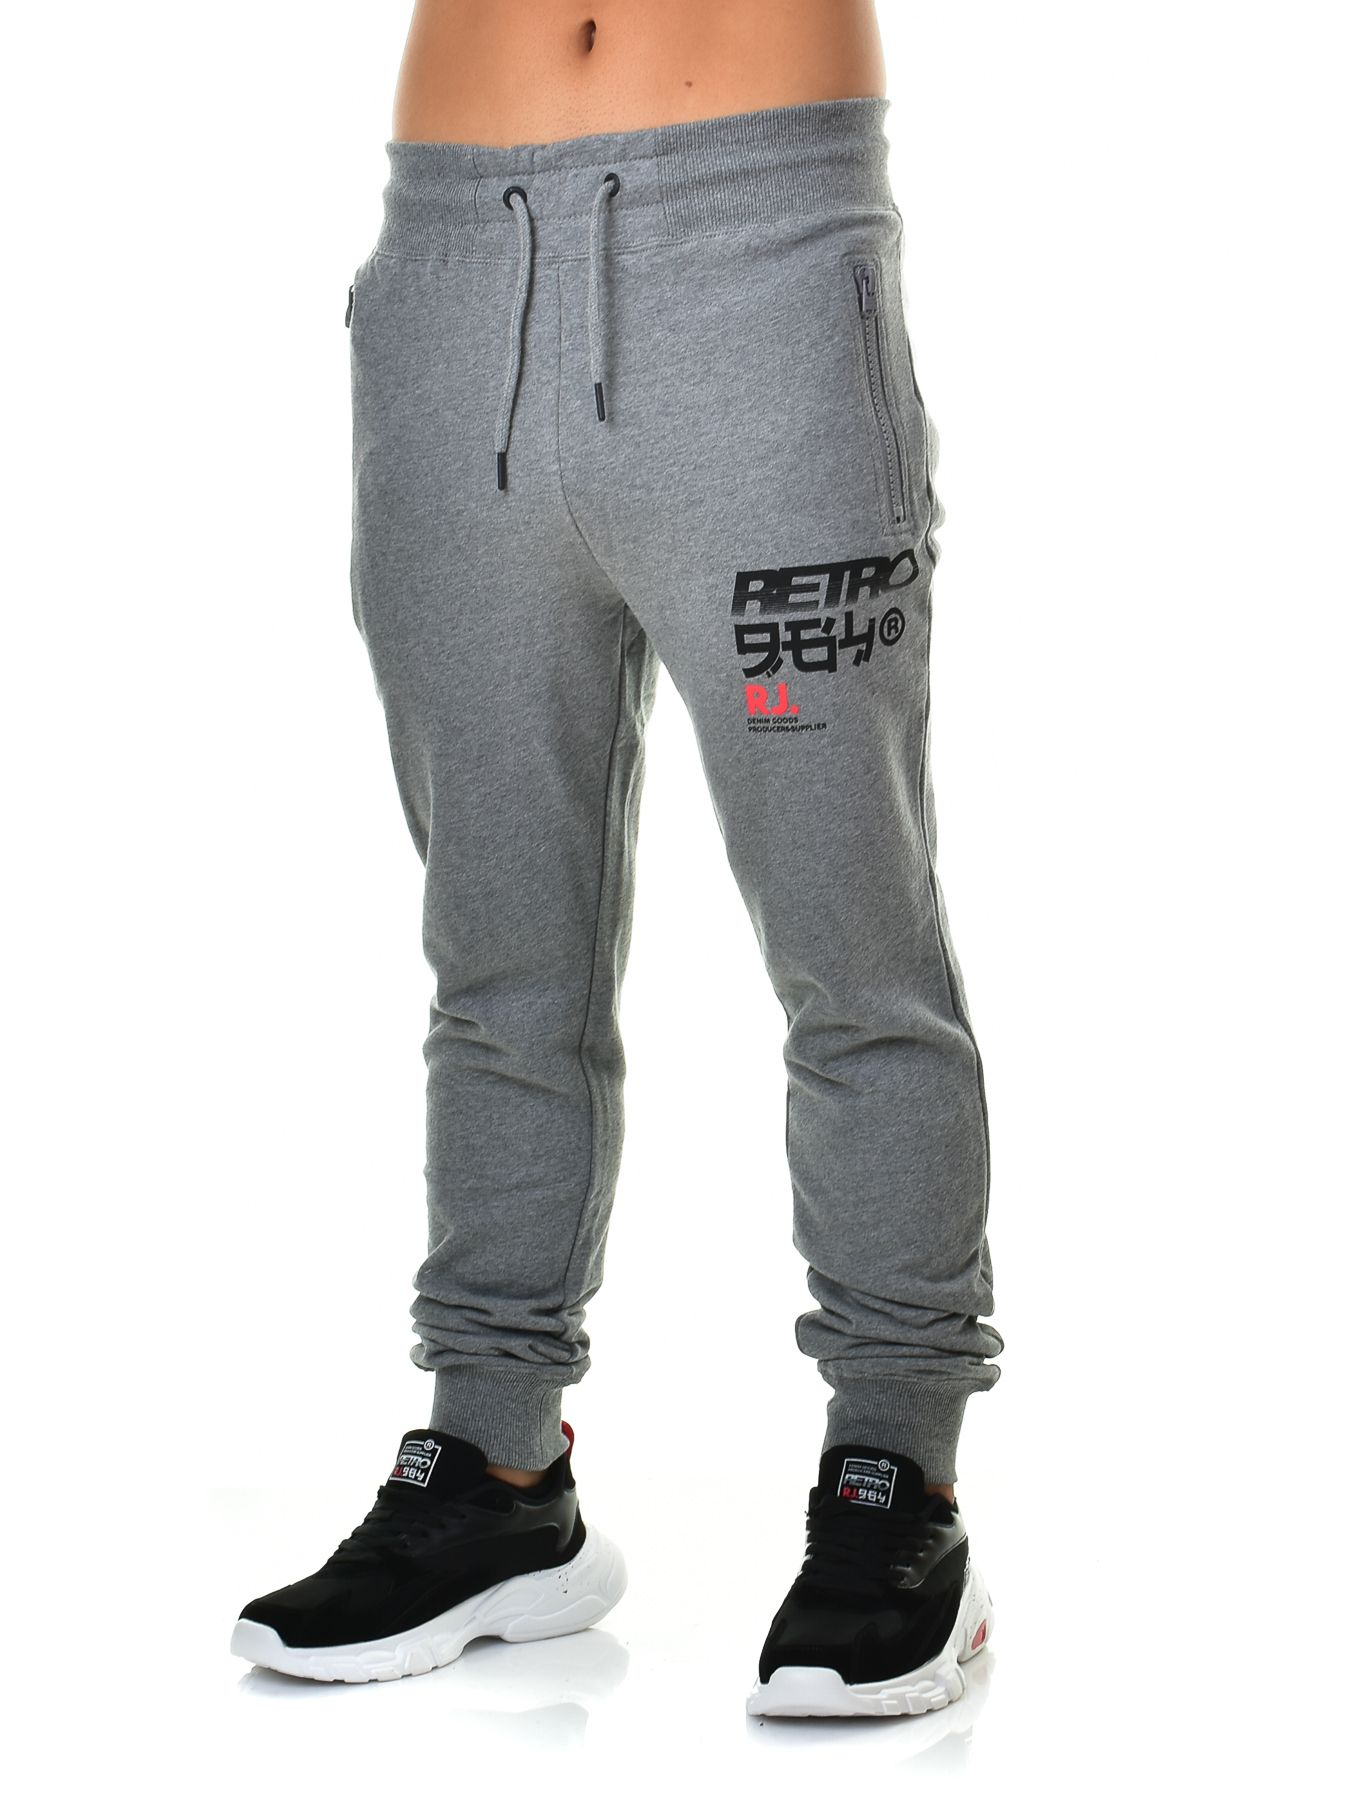 Retro Jeans férfi jogging alsó DHARKAN PANTS1